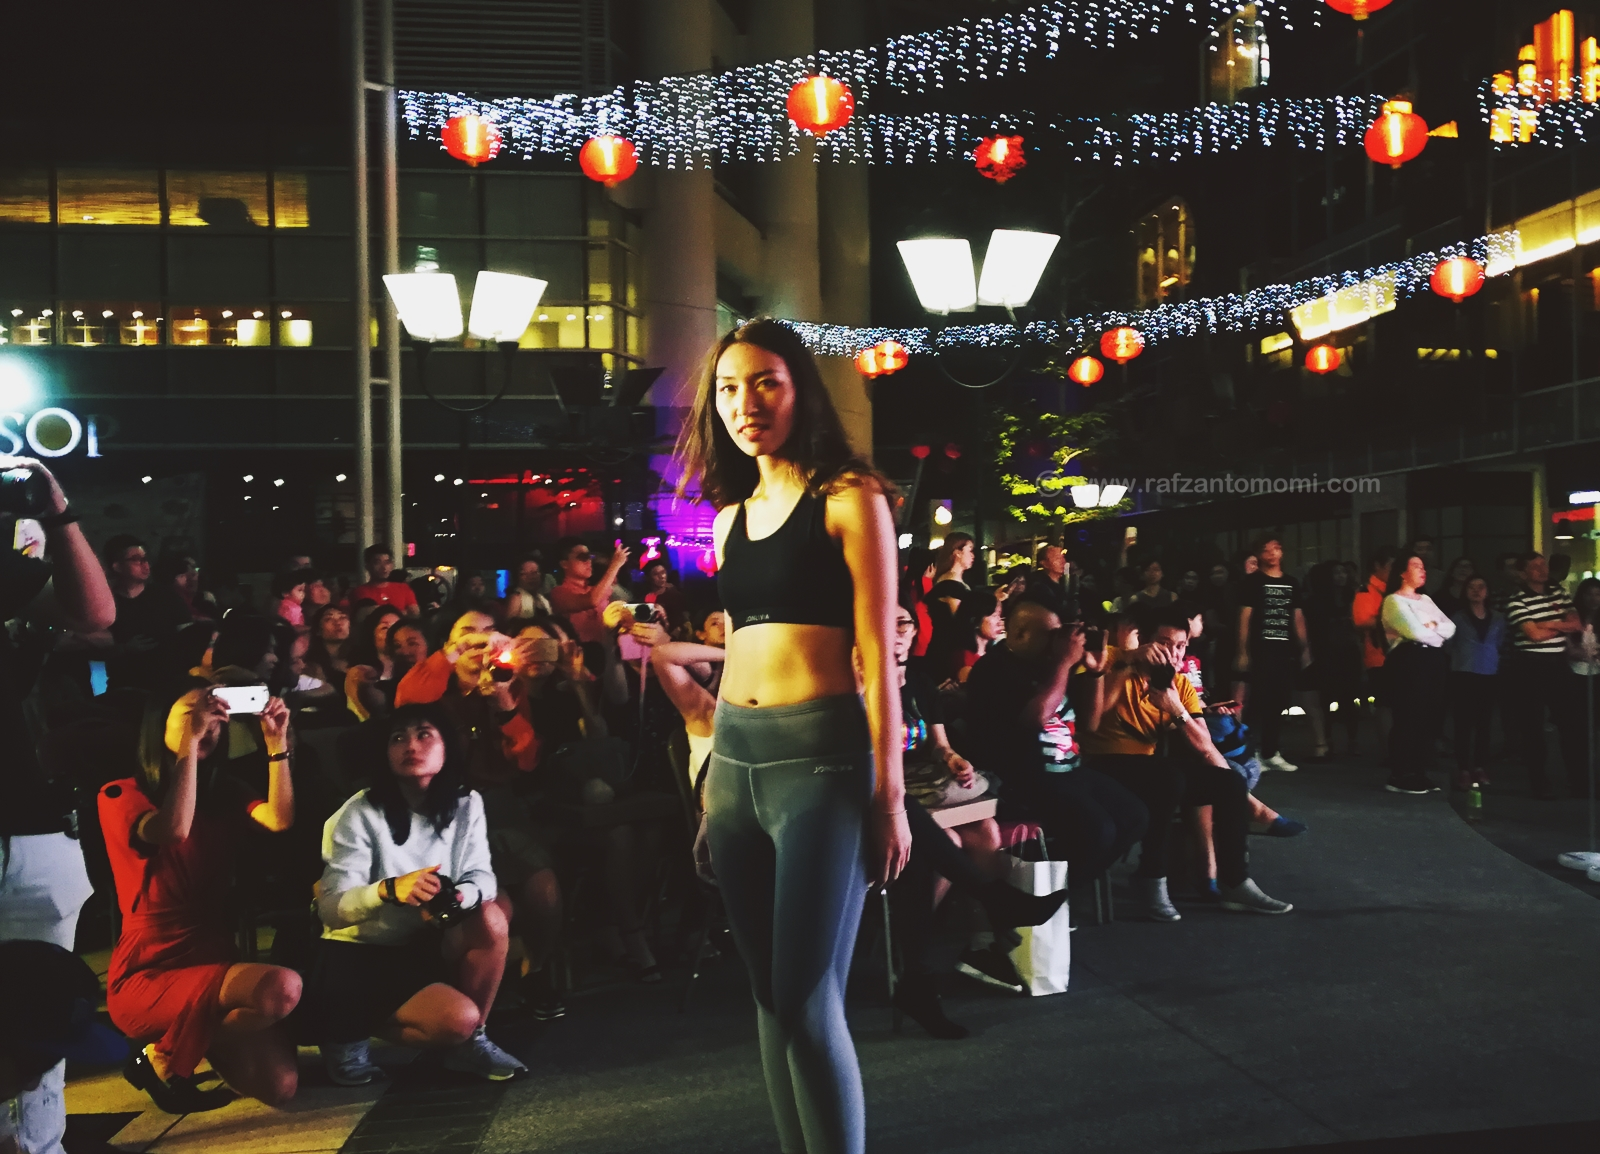 Jonlivia Melancarkan Seluar Fitness-Skincare & Pertandingan Peringkat Akhir 'Slimplezy Challenge' !